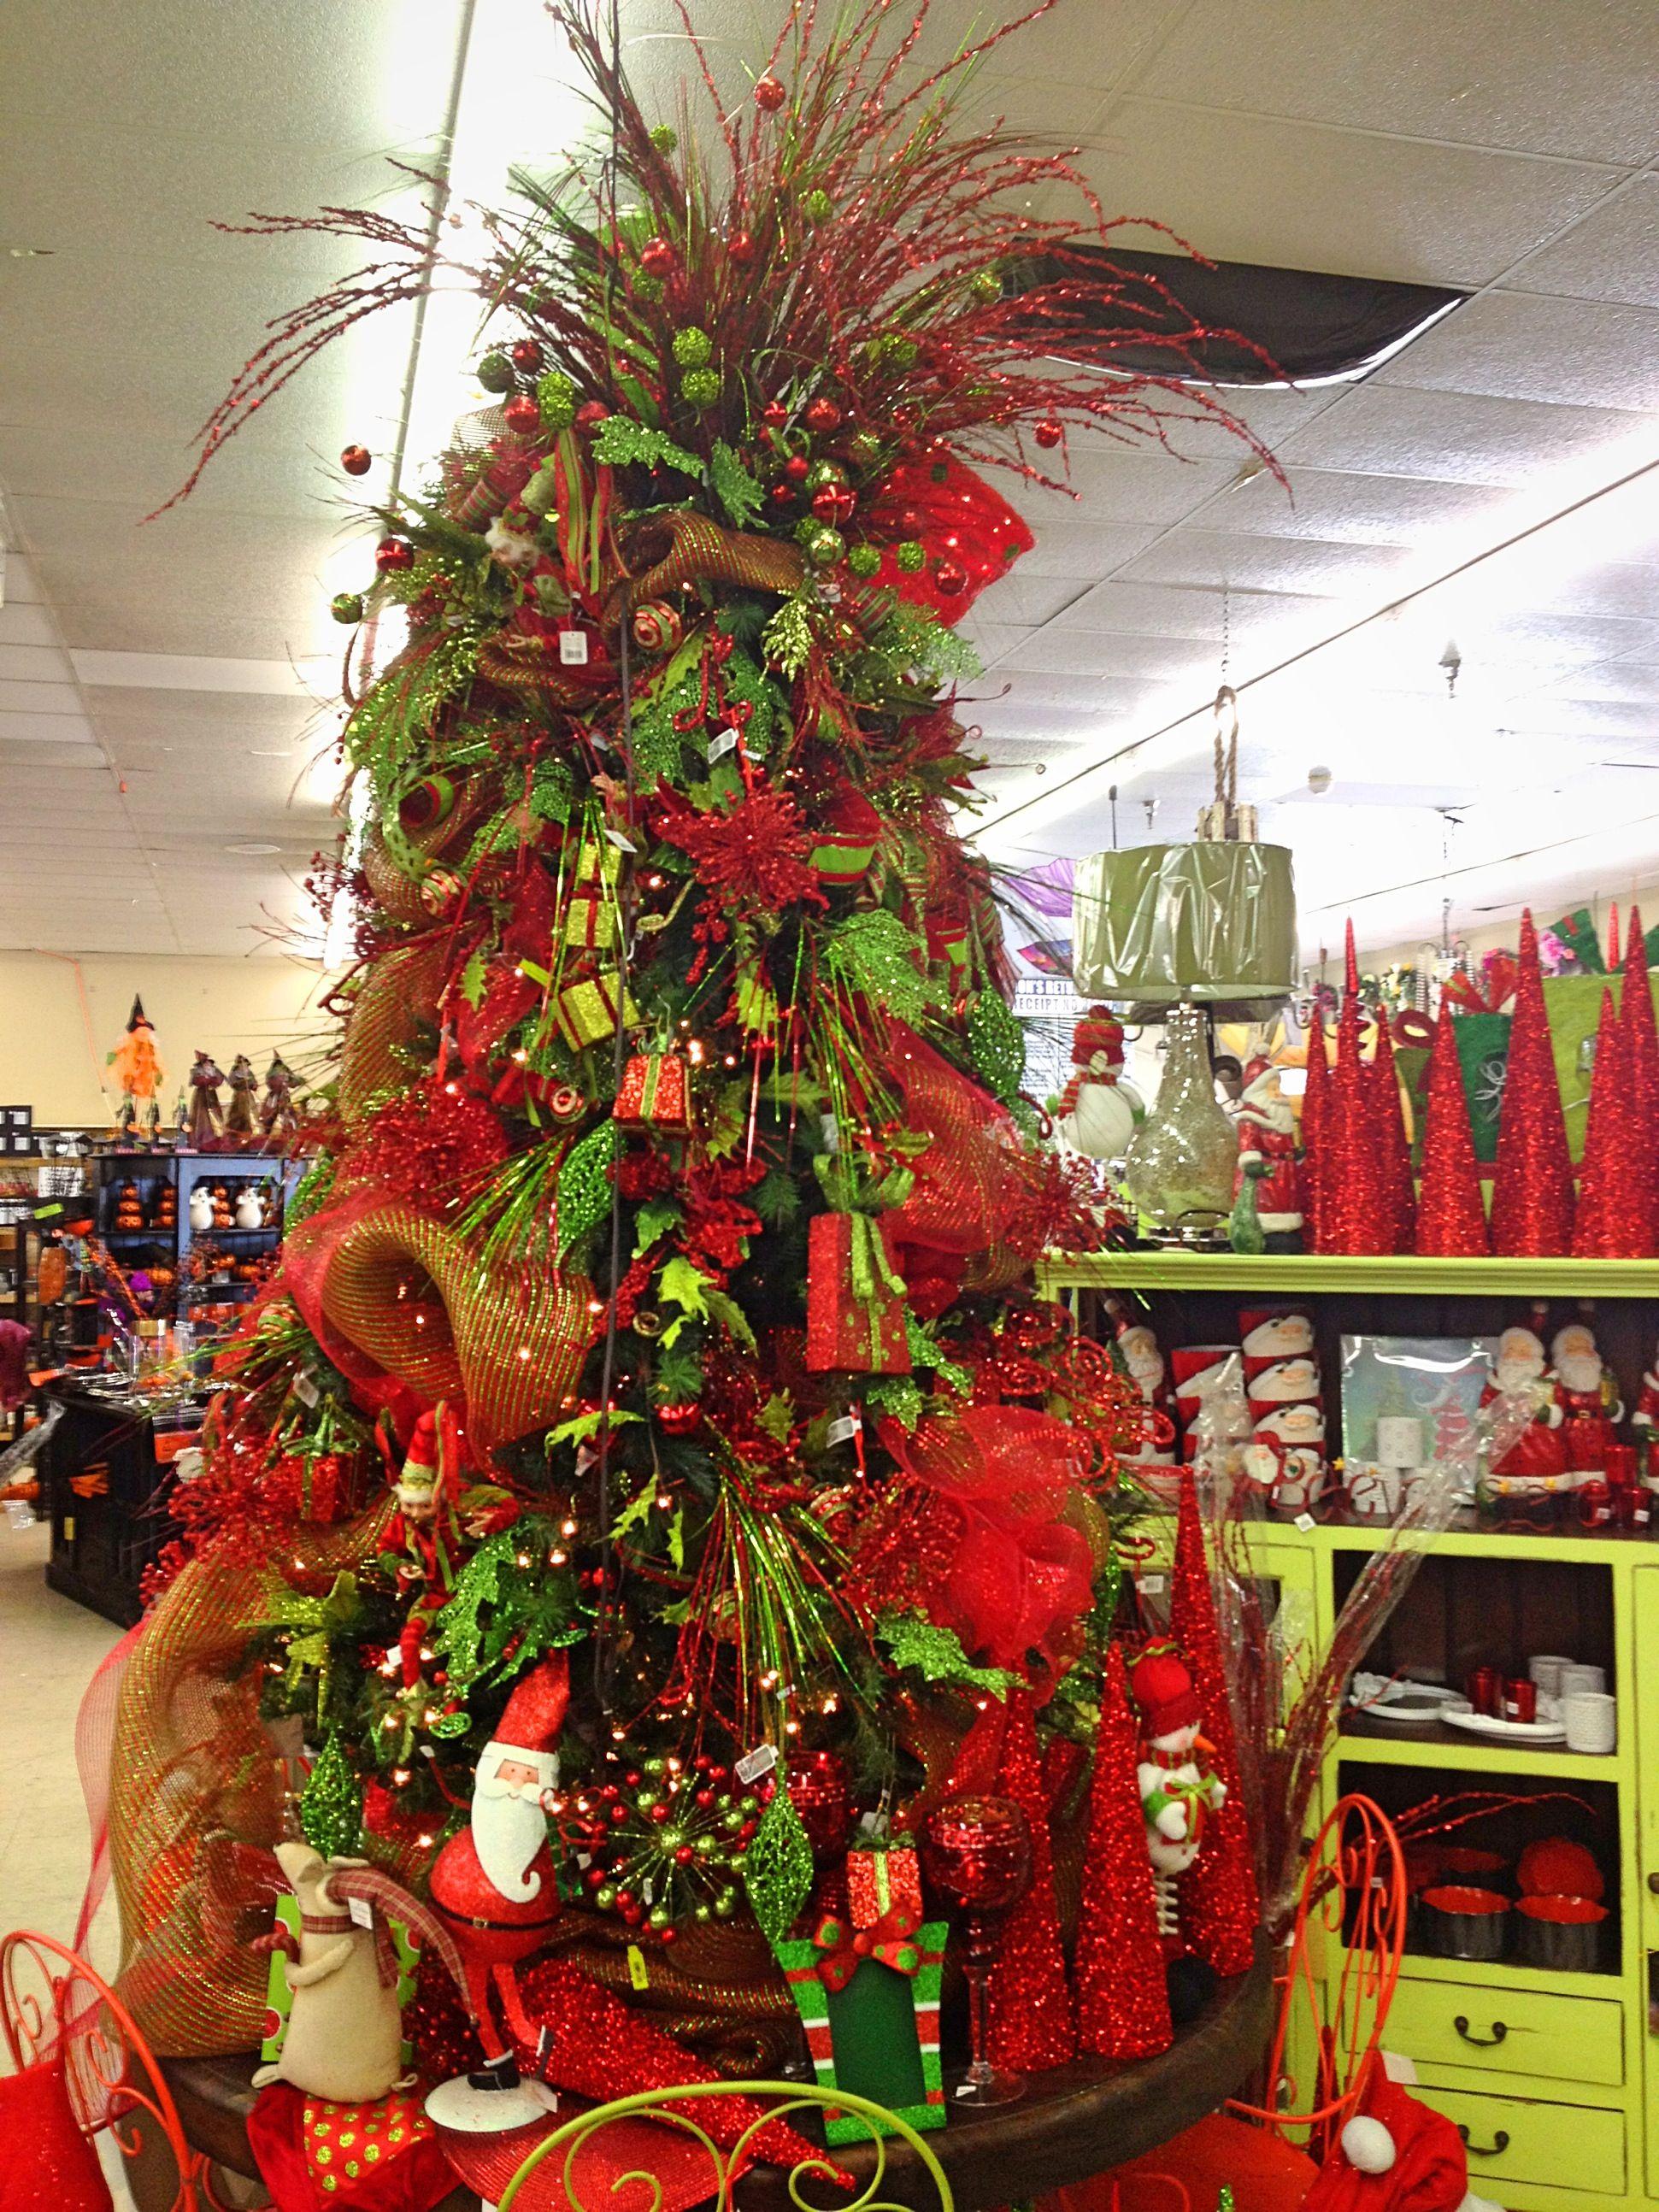 Red & green Christmas tree Christmas decor Pinterest